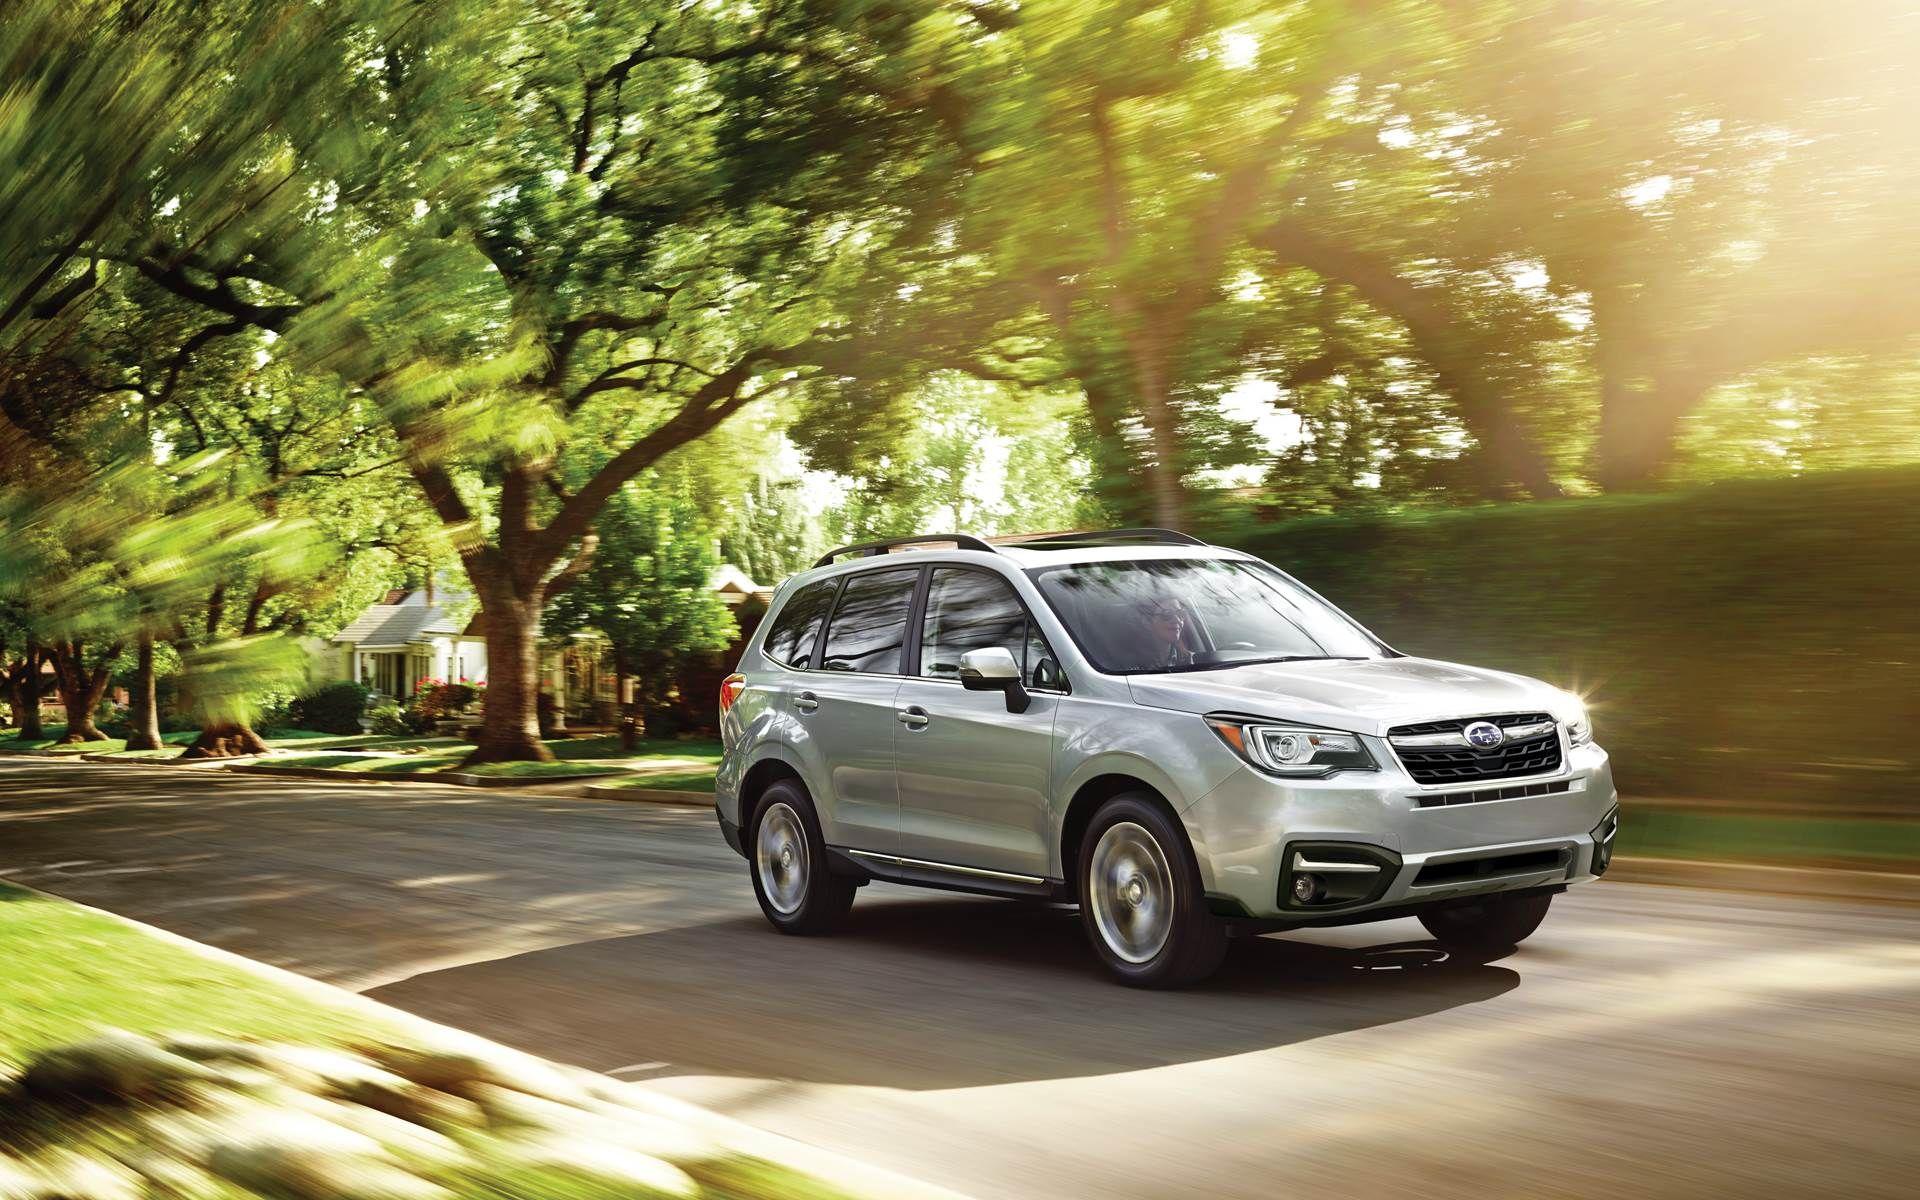 2017 Forester Subaru forester, Subaru, Car